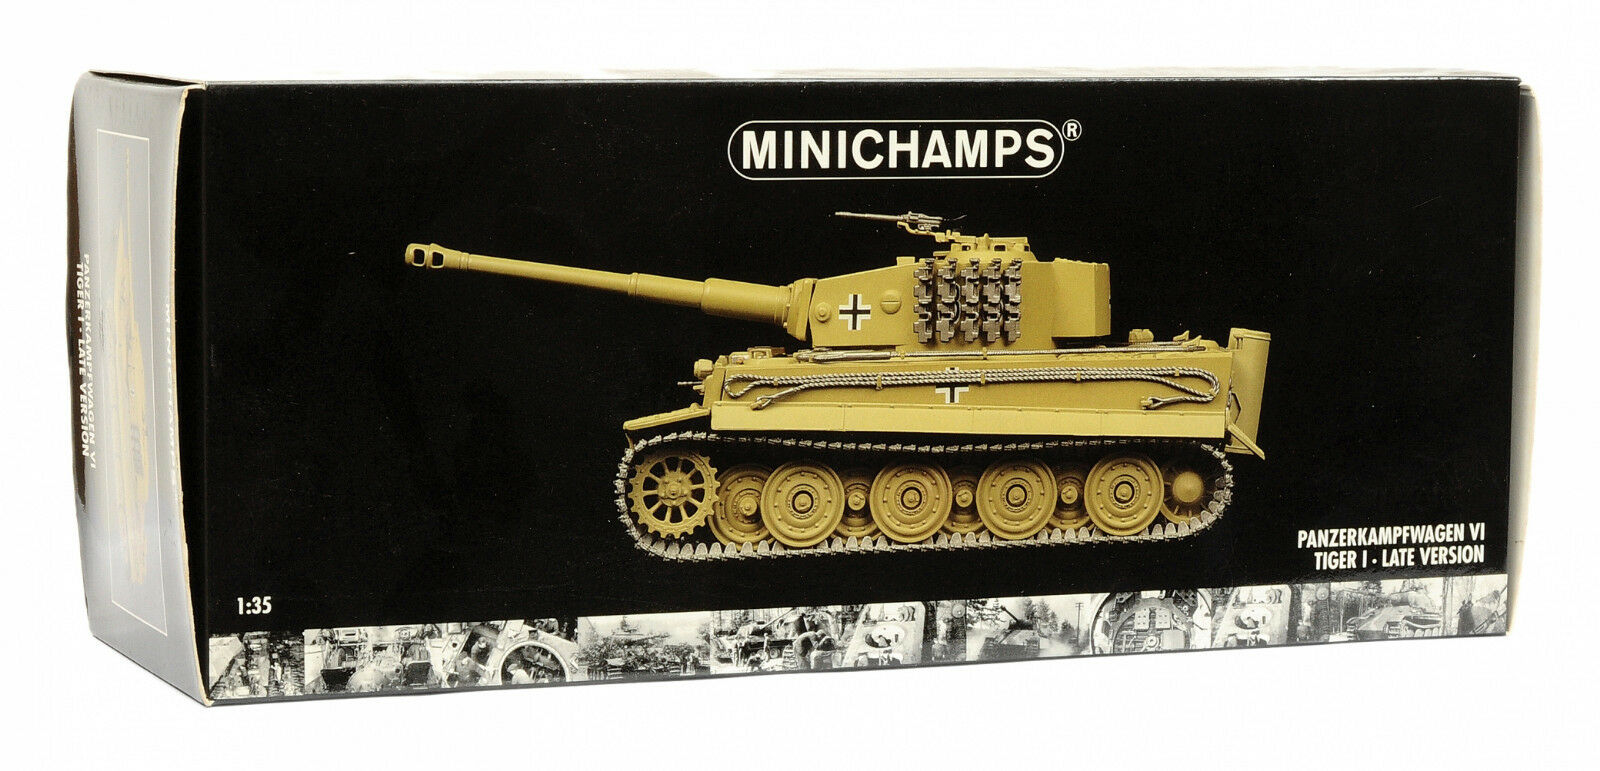 Minichamps 1 35 Panzerkampfwagen VI TIGER I Late Version